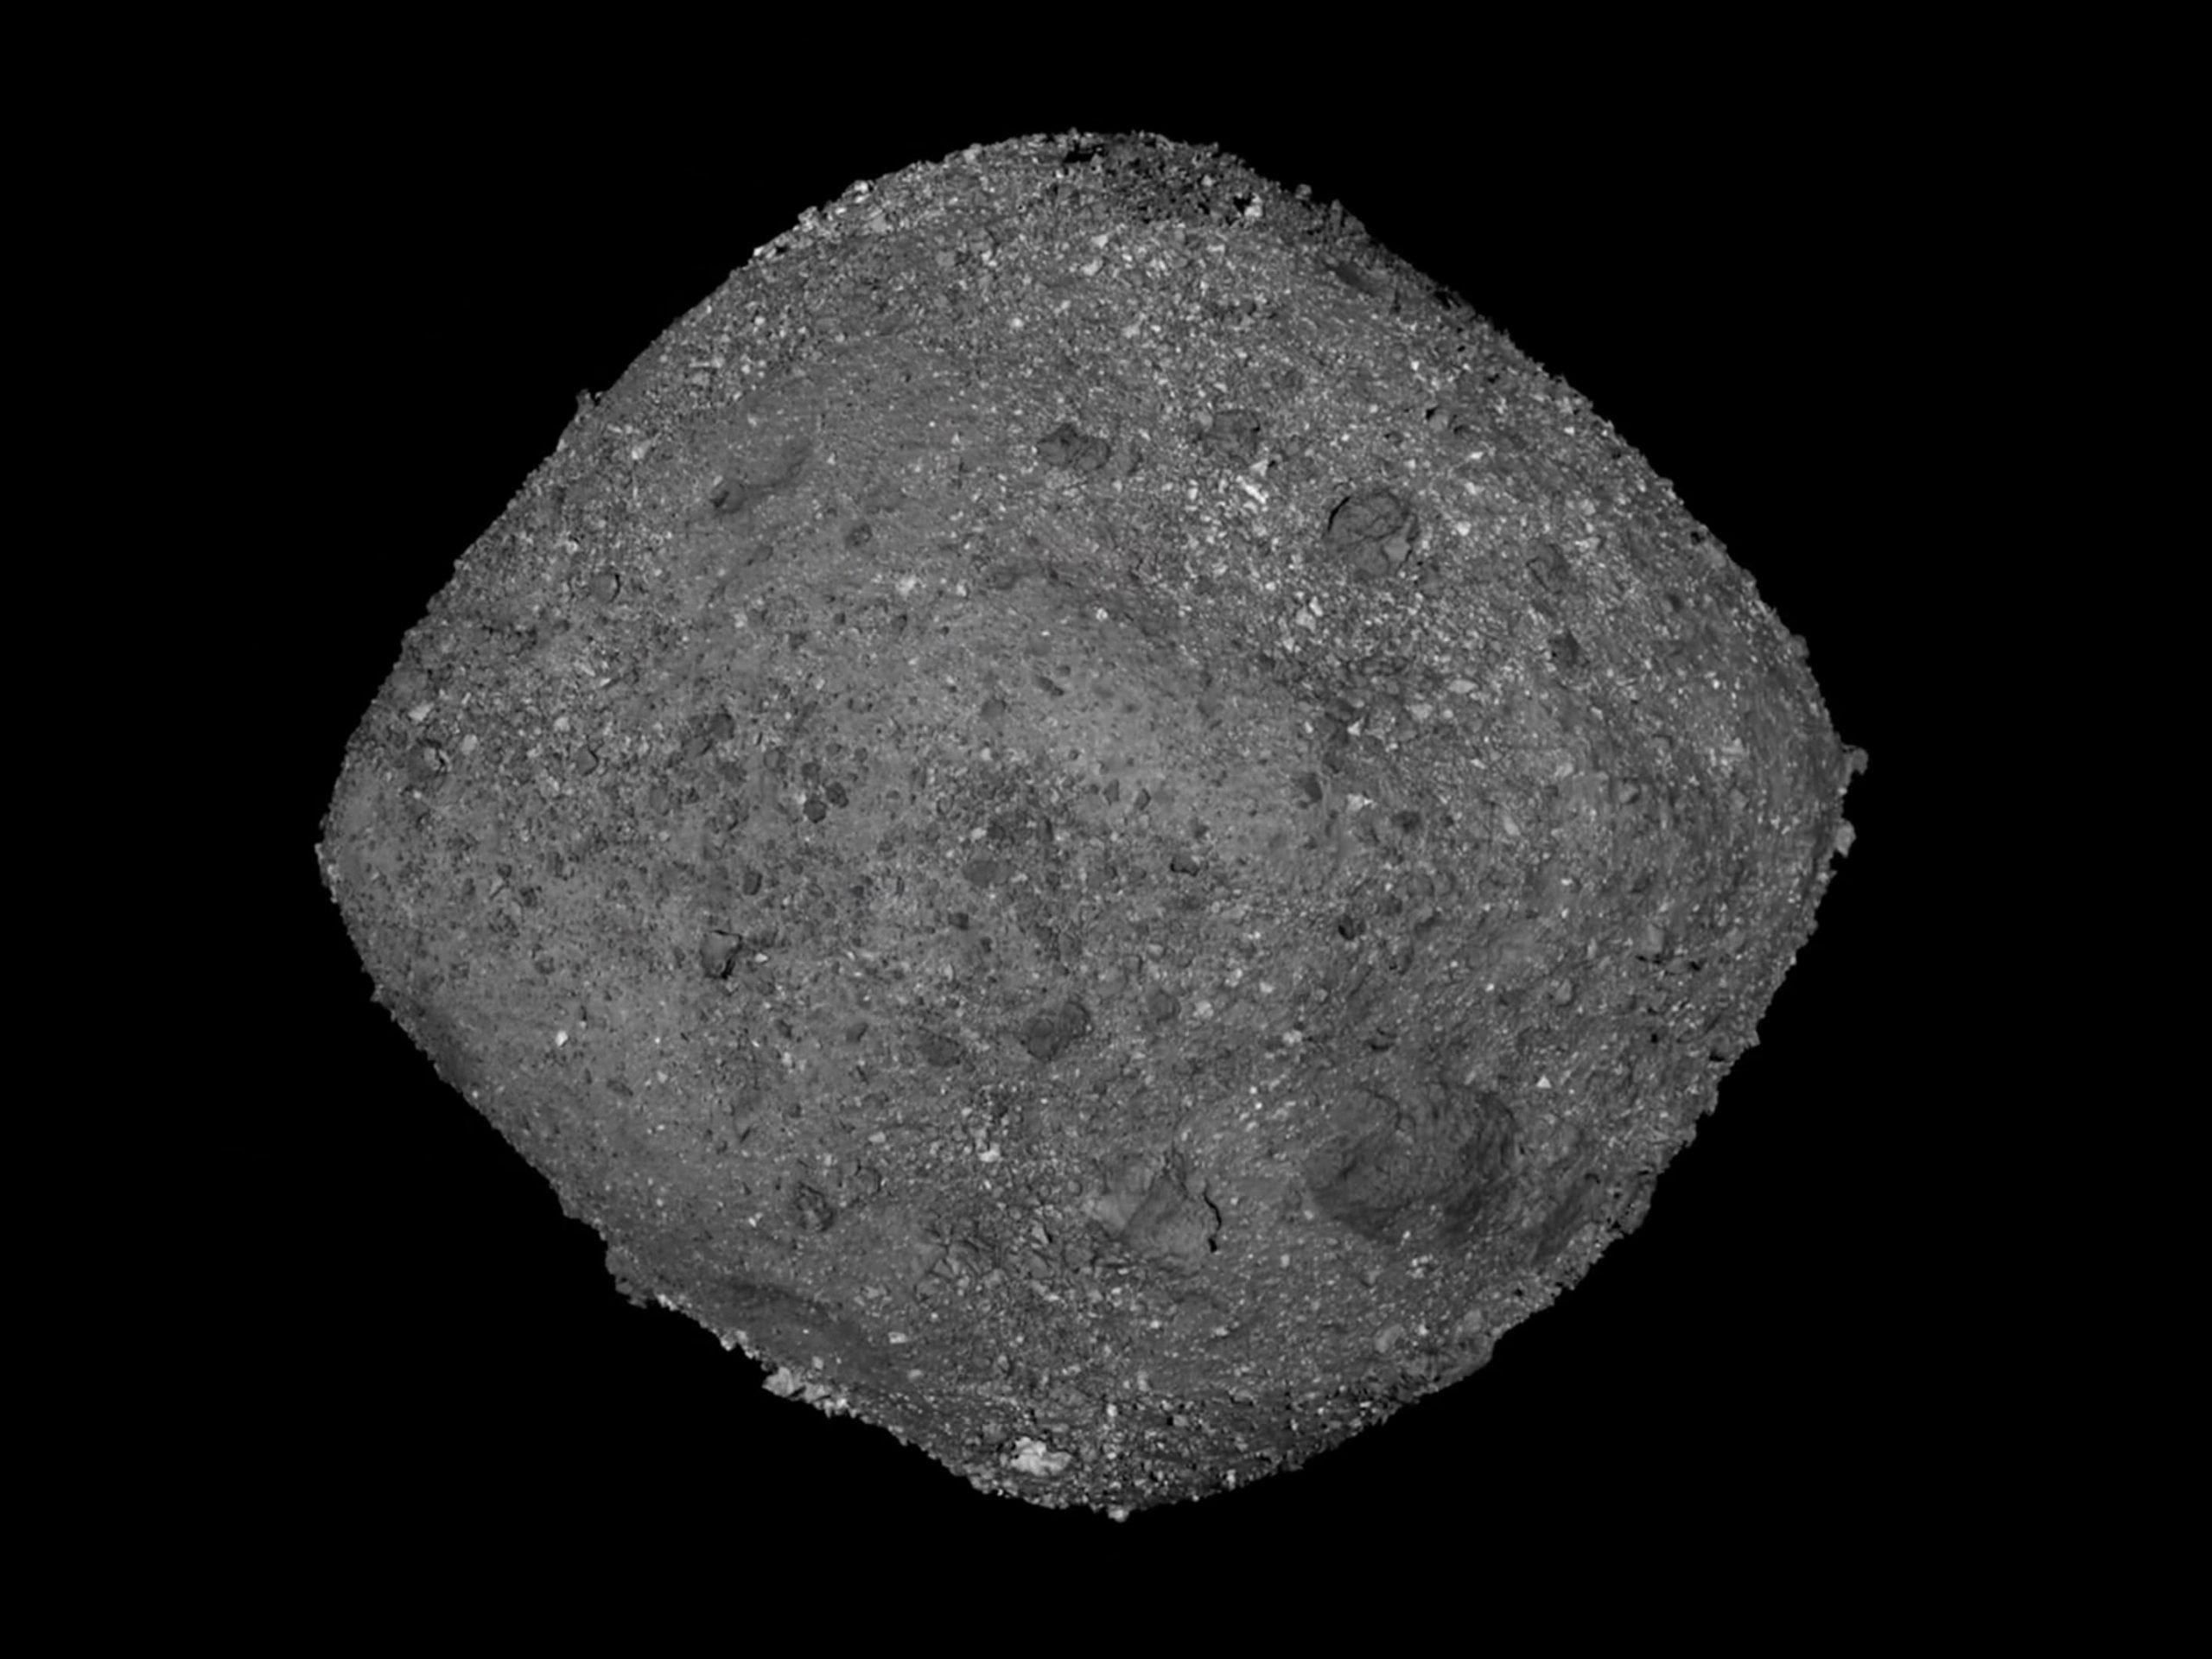 NASA sonda foto asteroide